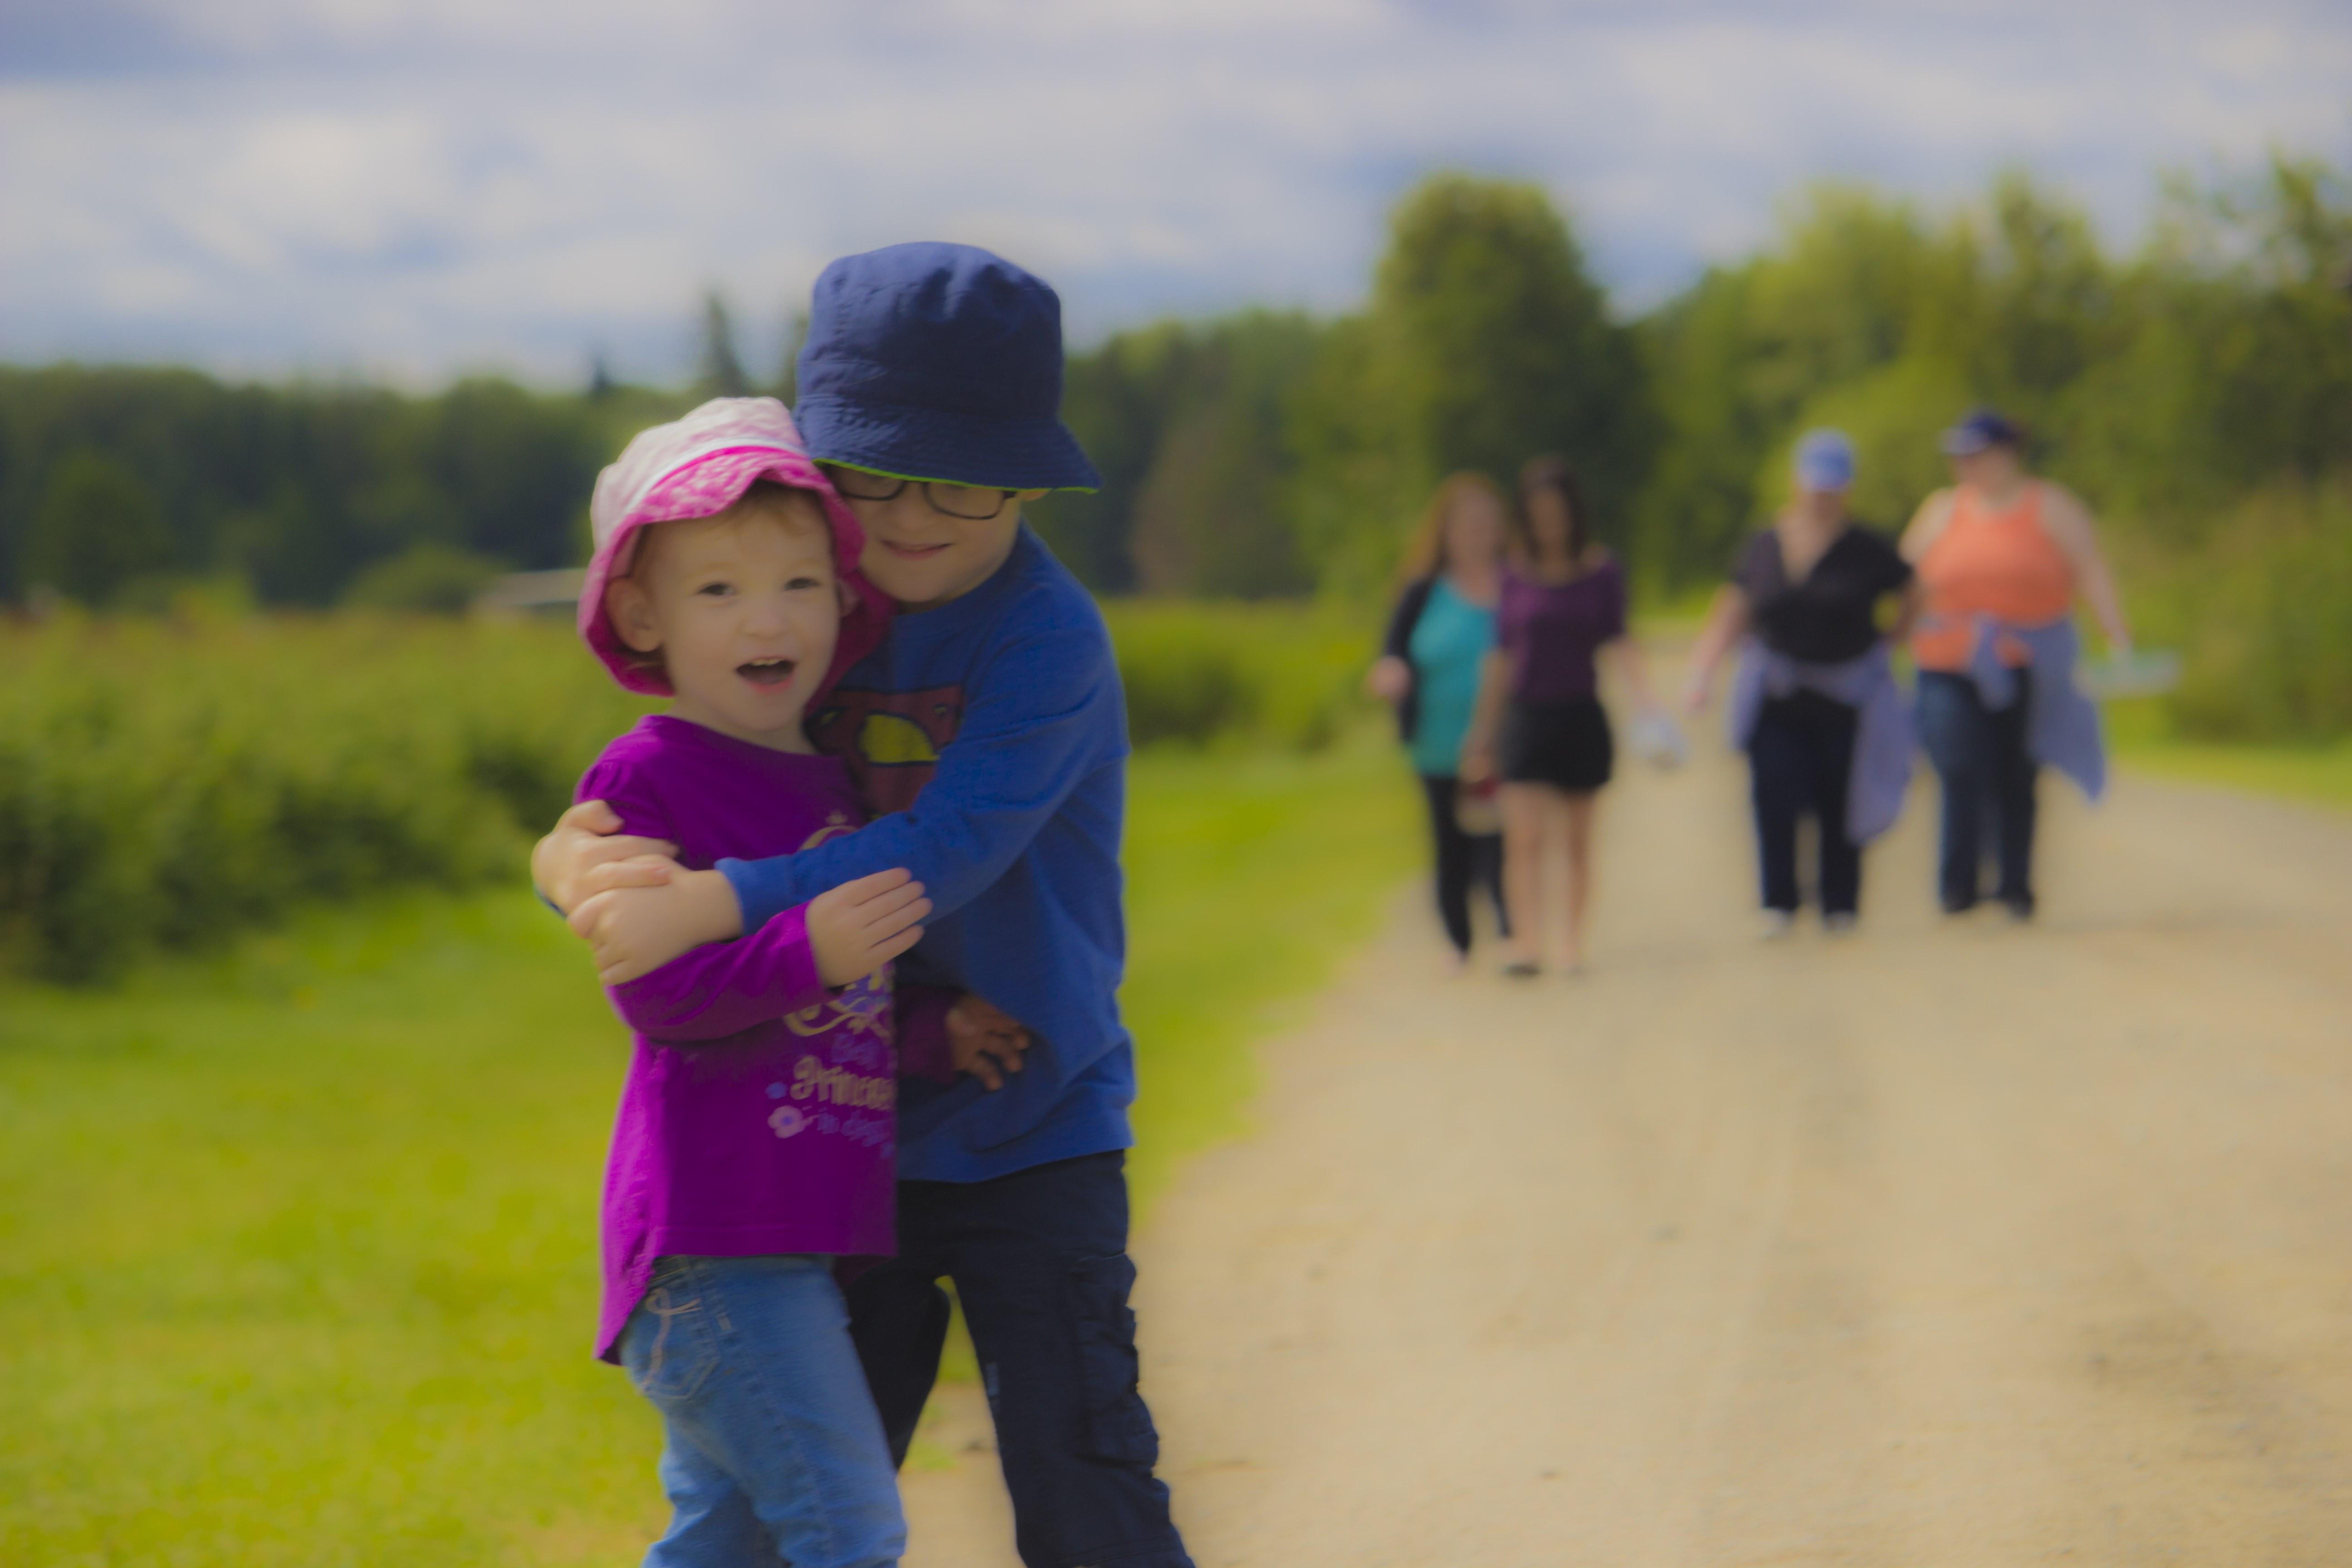 running kid hug